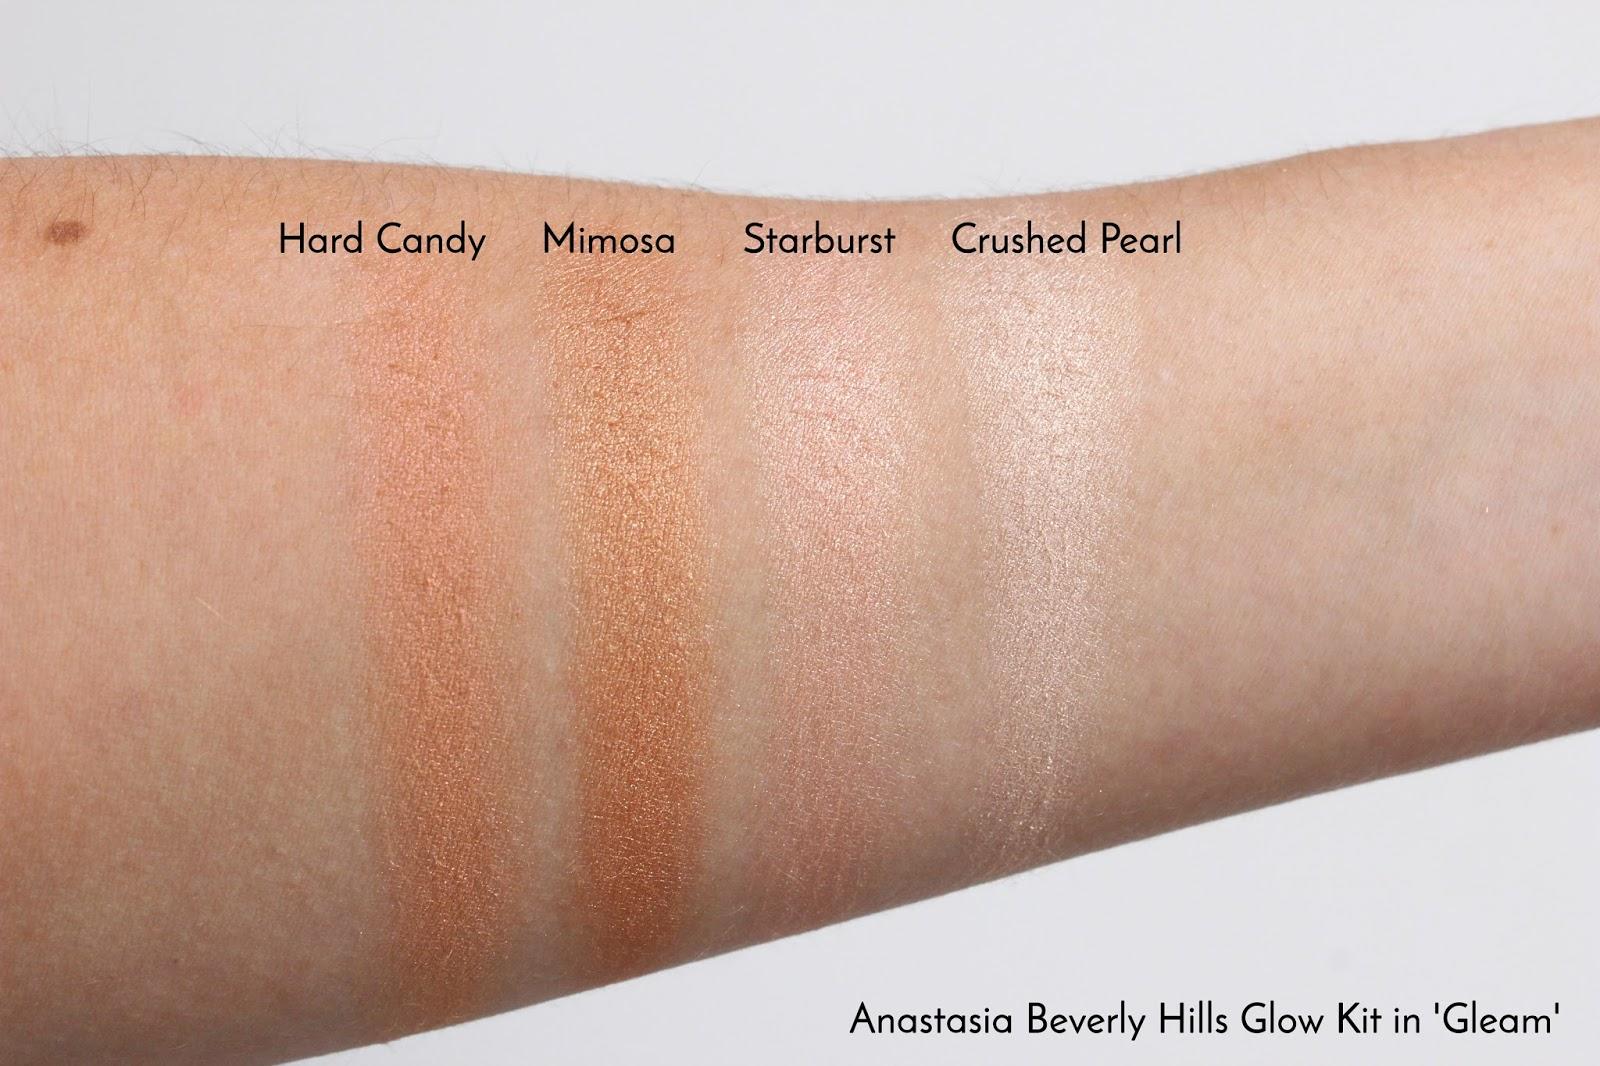 Powder Contour Kit - Light To Medium by Anastasia Beverly Hills #21